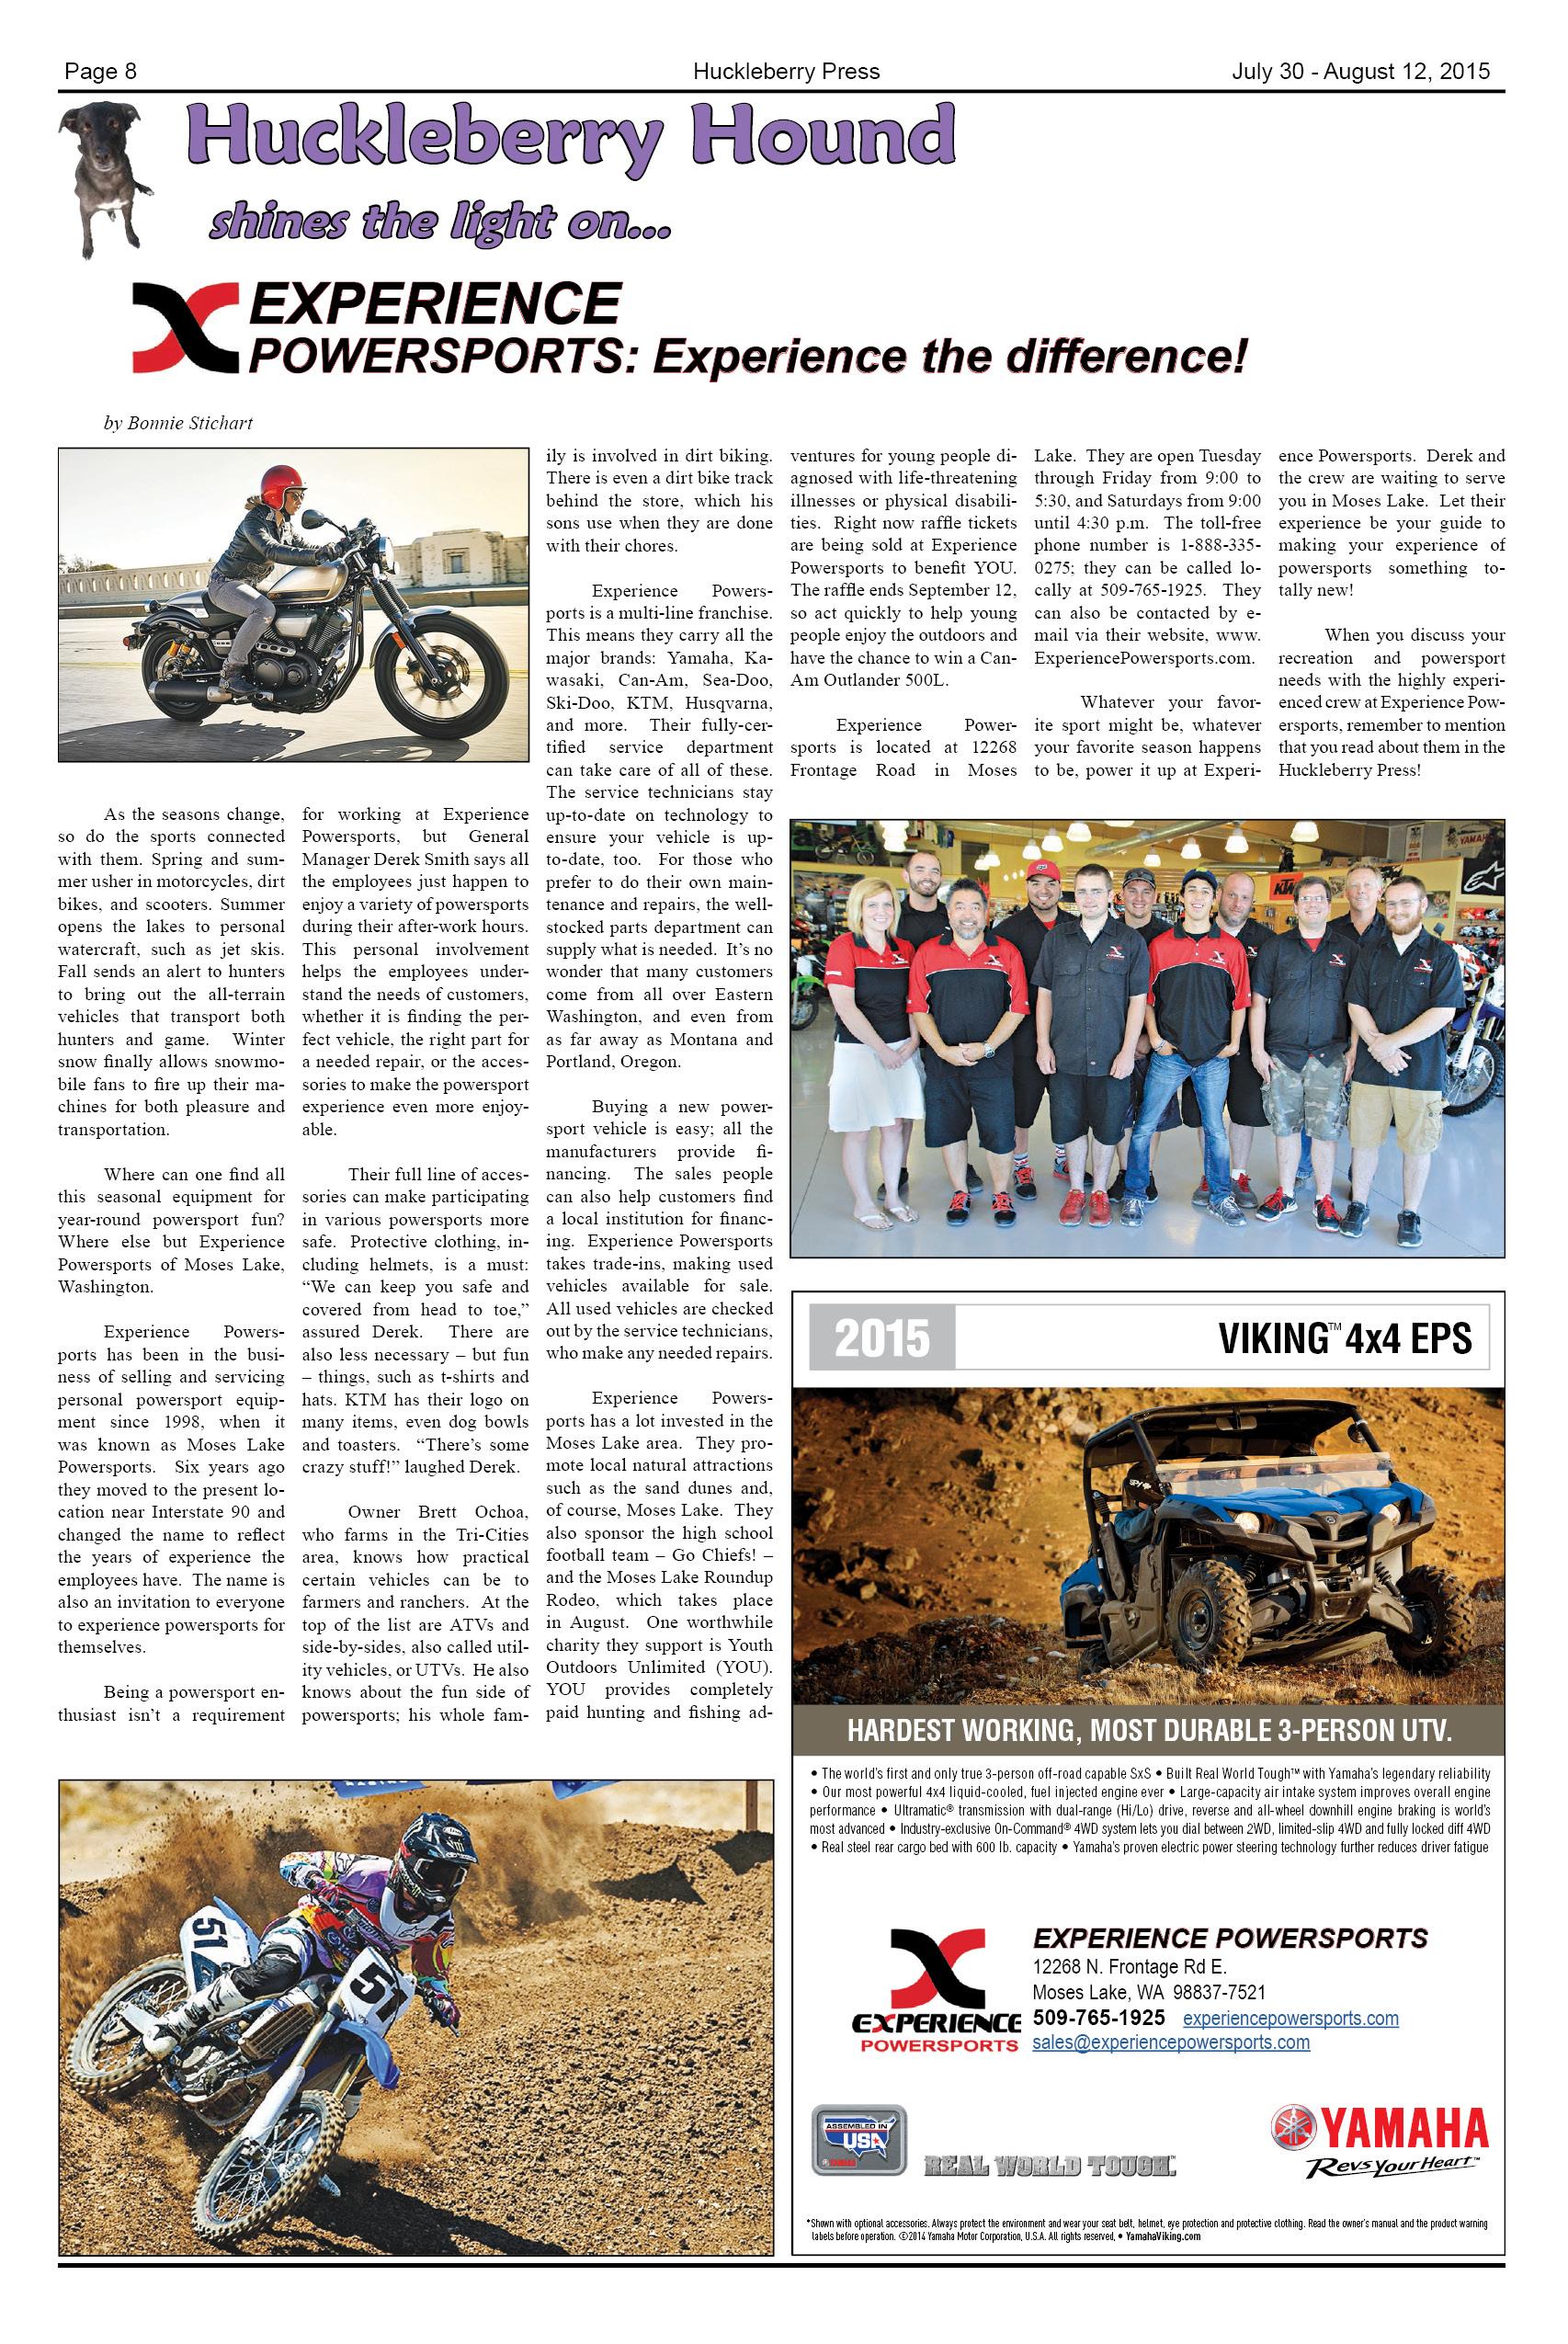 Huck_Press-2015-July_30-pg8